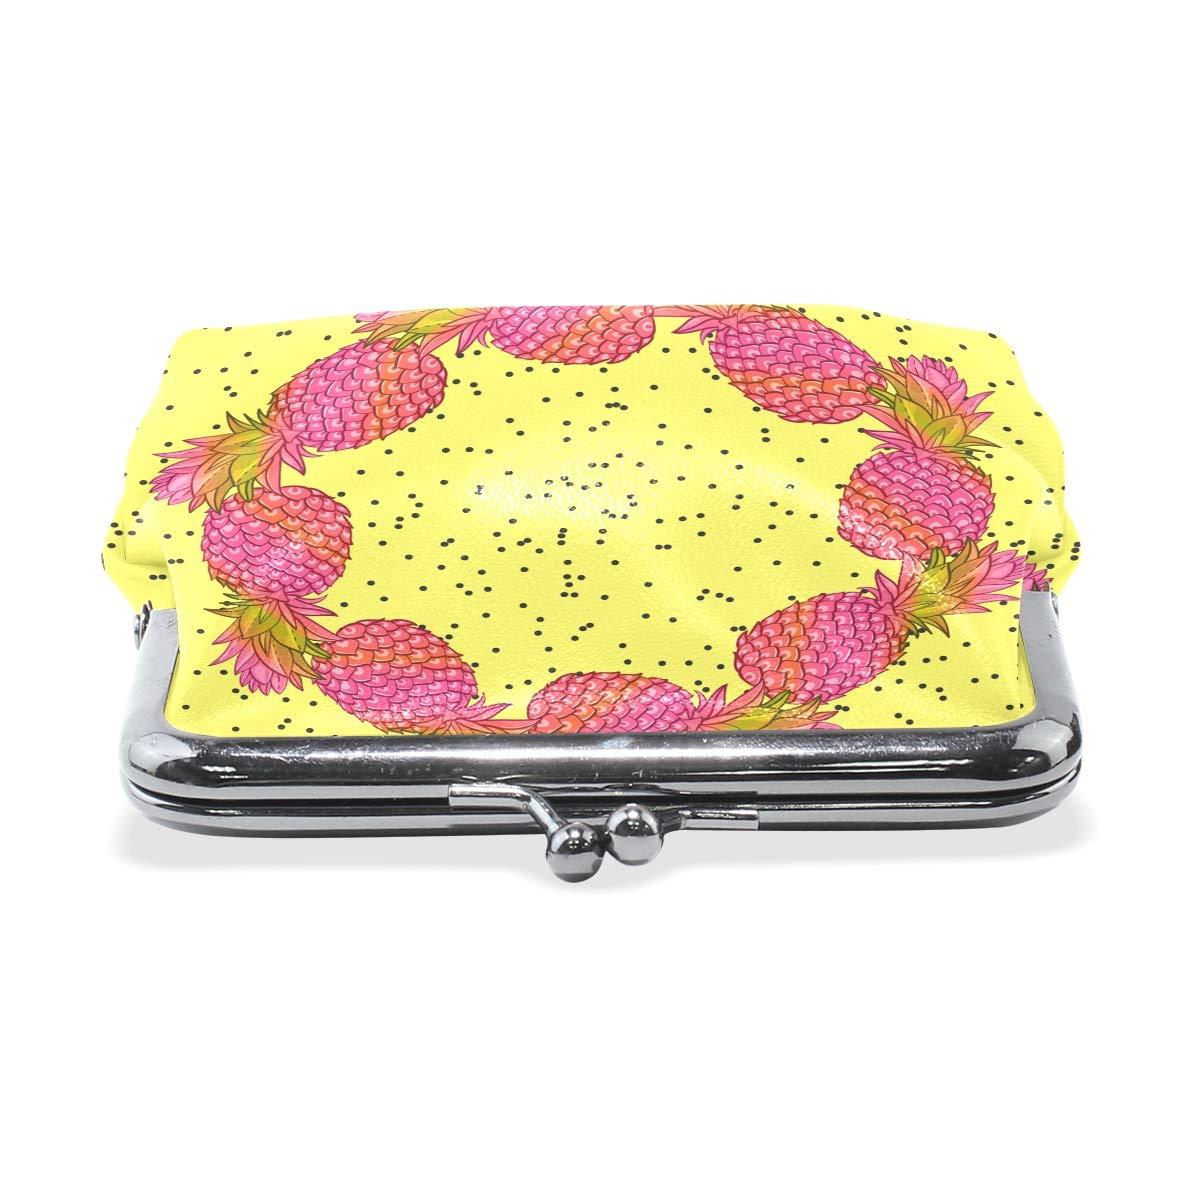 Fashion Womens Coin Purse Pineapple Wreath Vintage Pouch Mini Purse Wallets